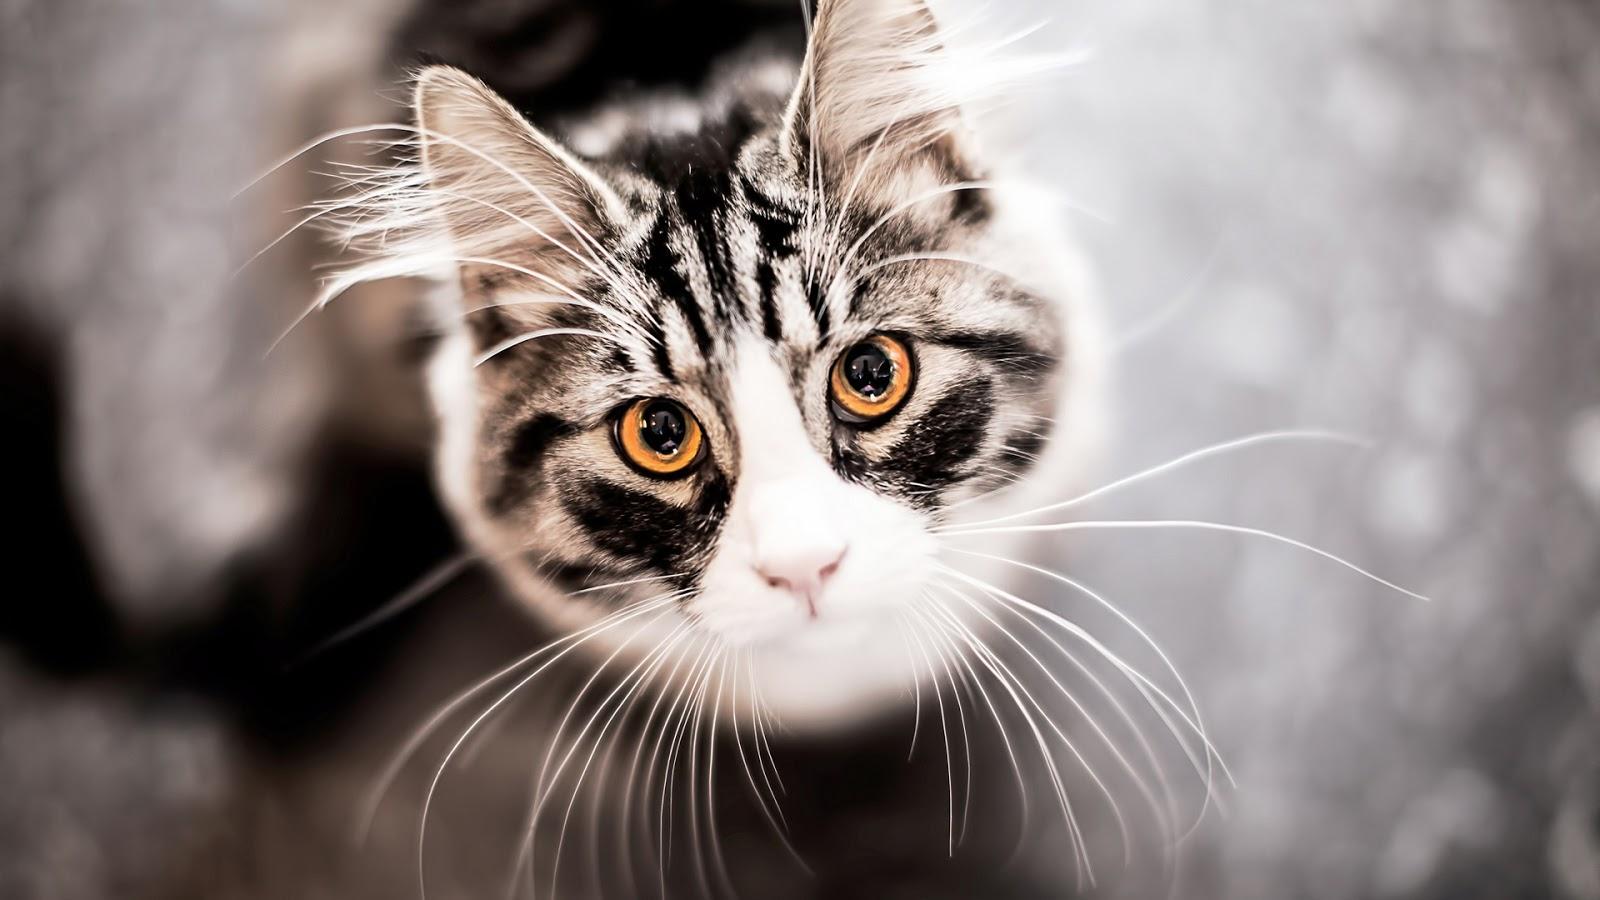 Cats Funny Face  Full HD Desktop Wallpapers 1080p